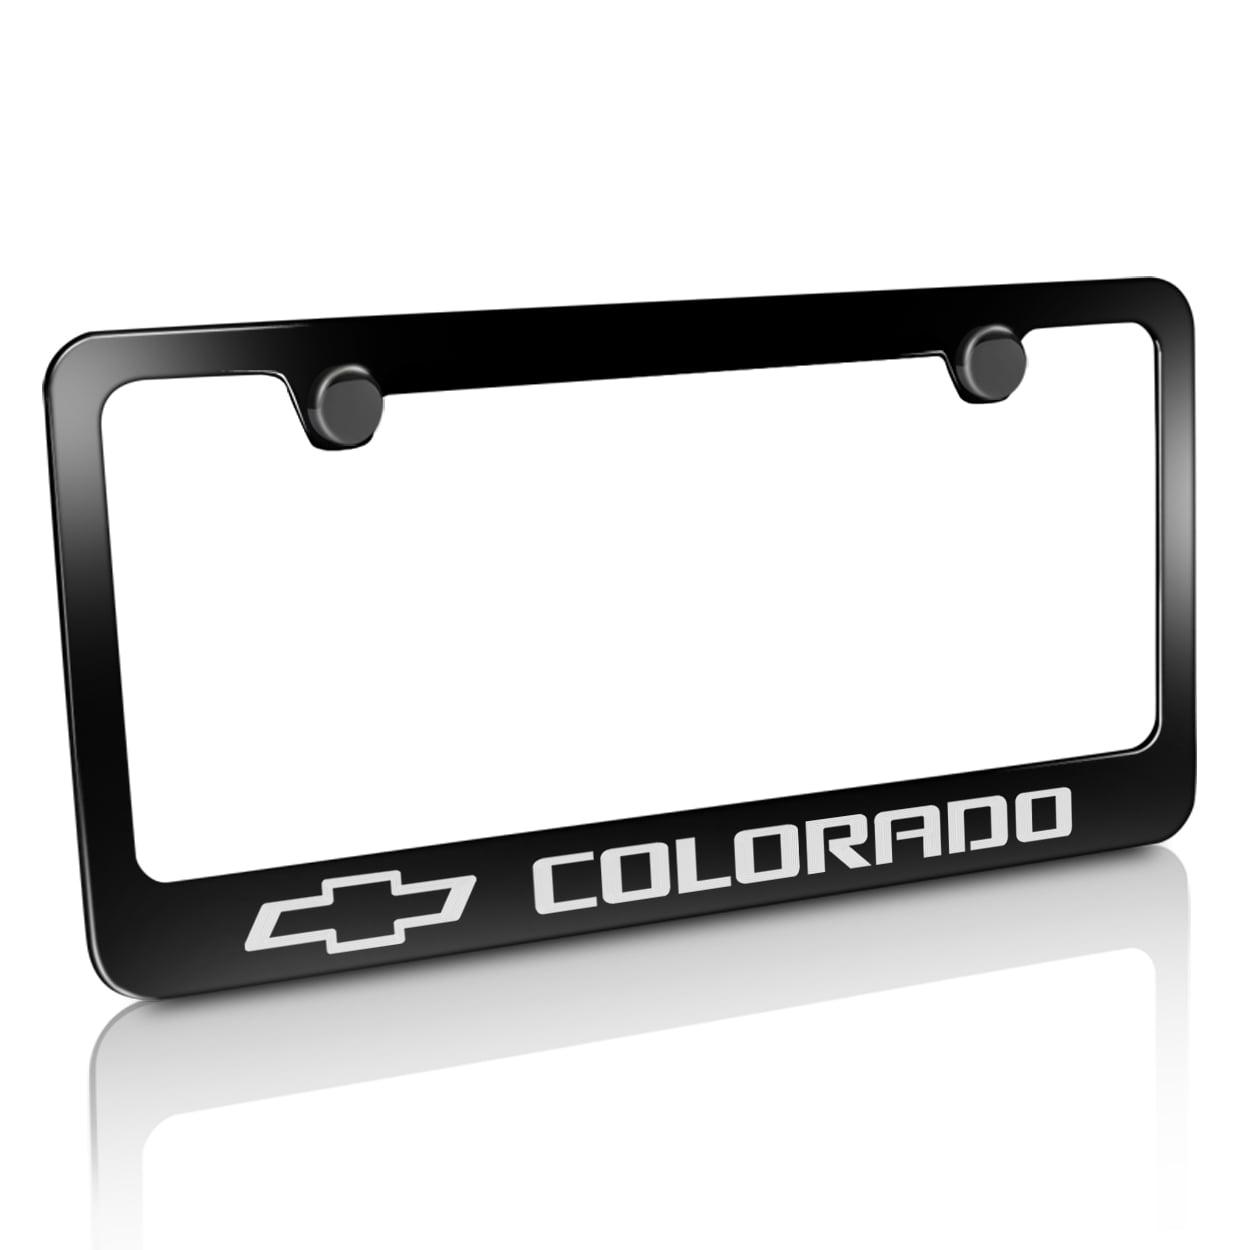 Chevrolet Colorado Black Metal License Plate Frame